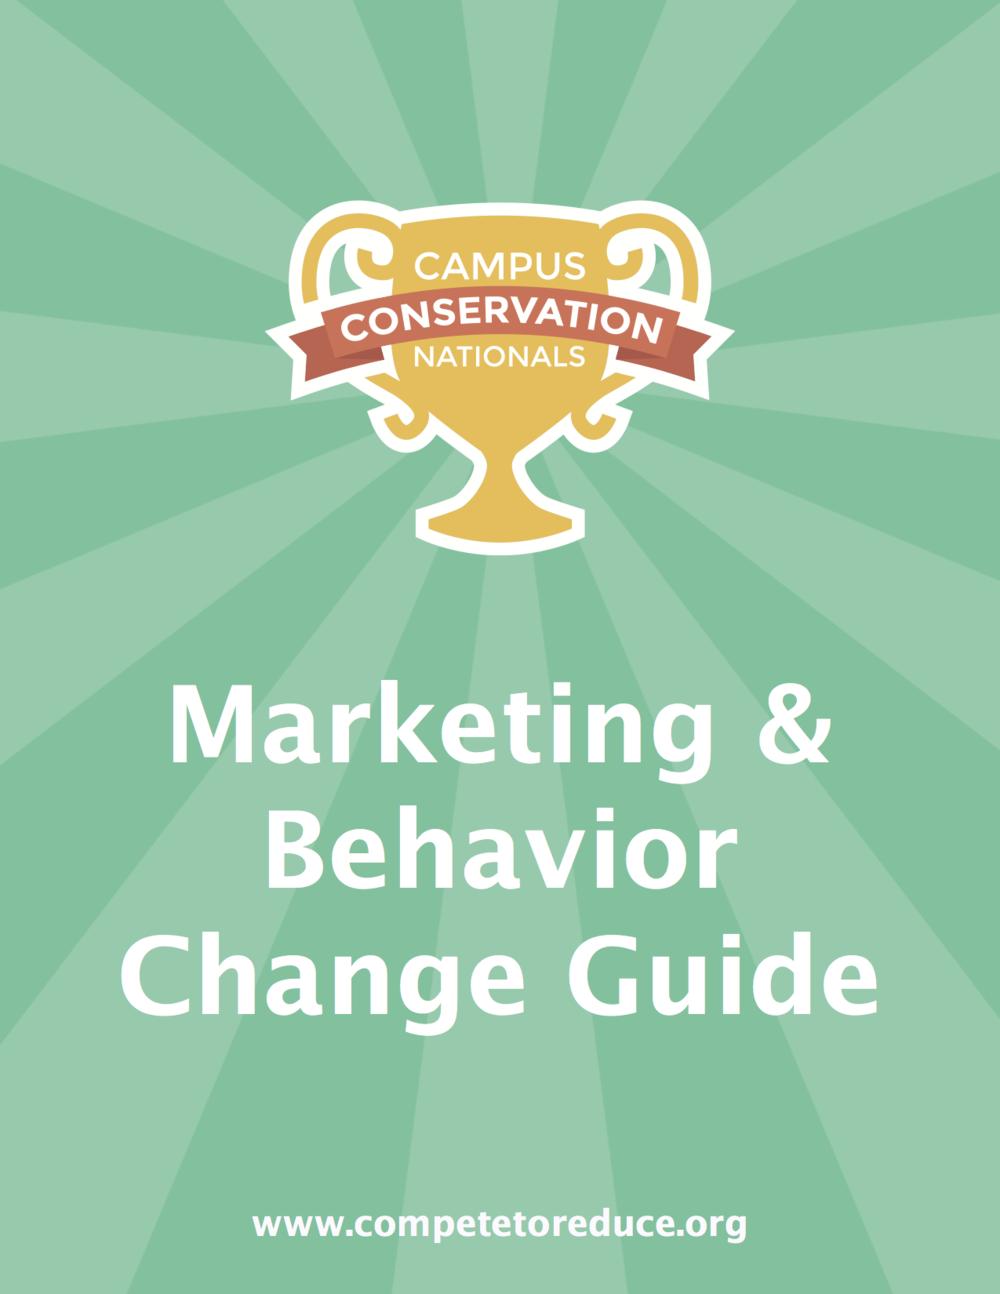 Marketing & Behavior Change Guide